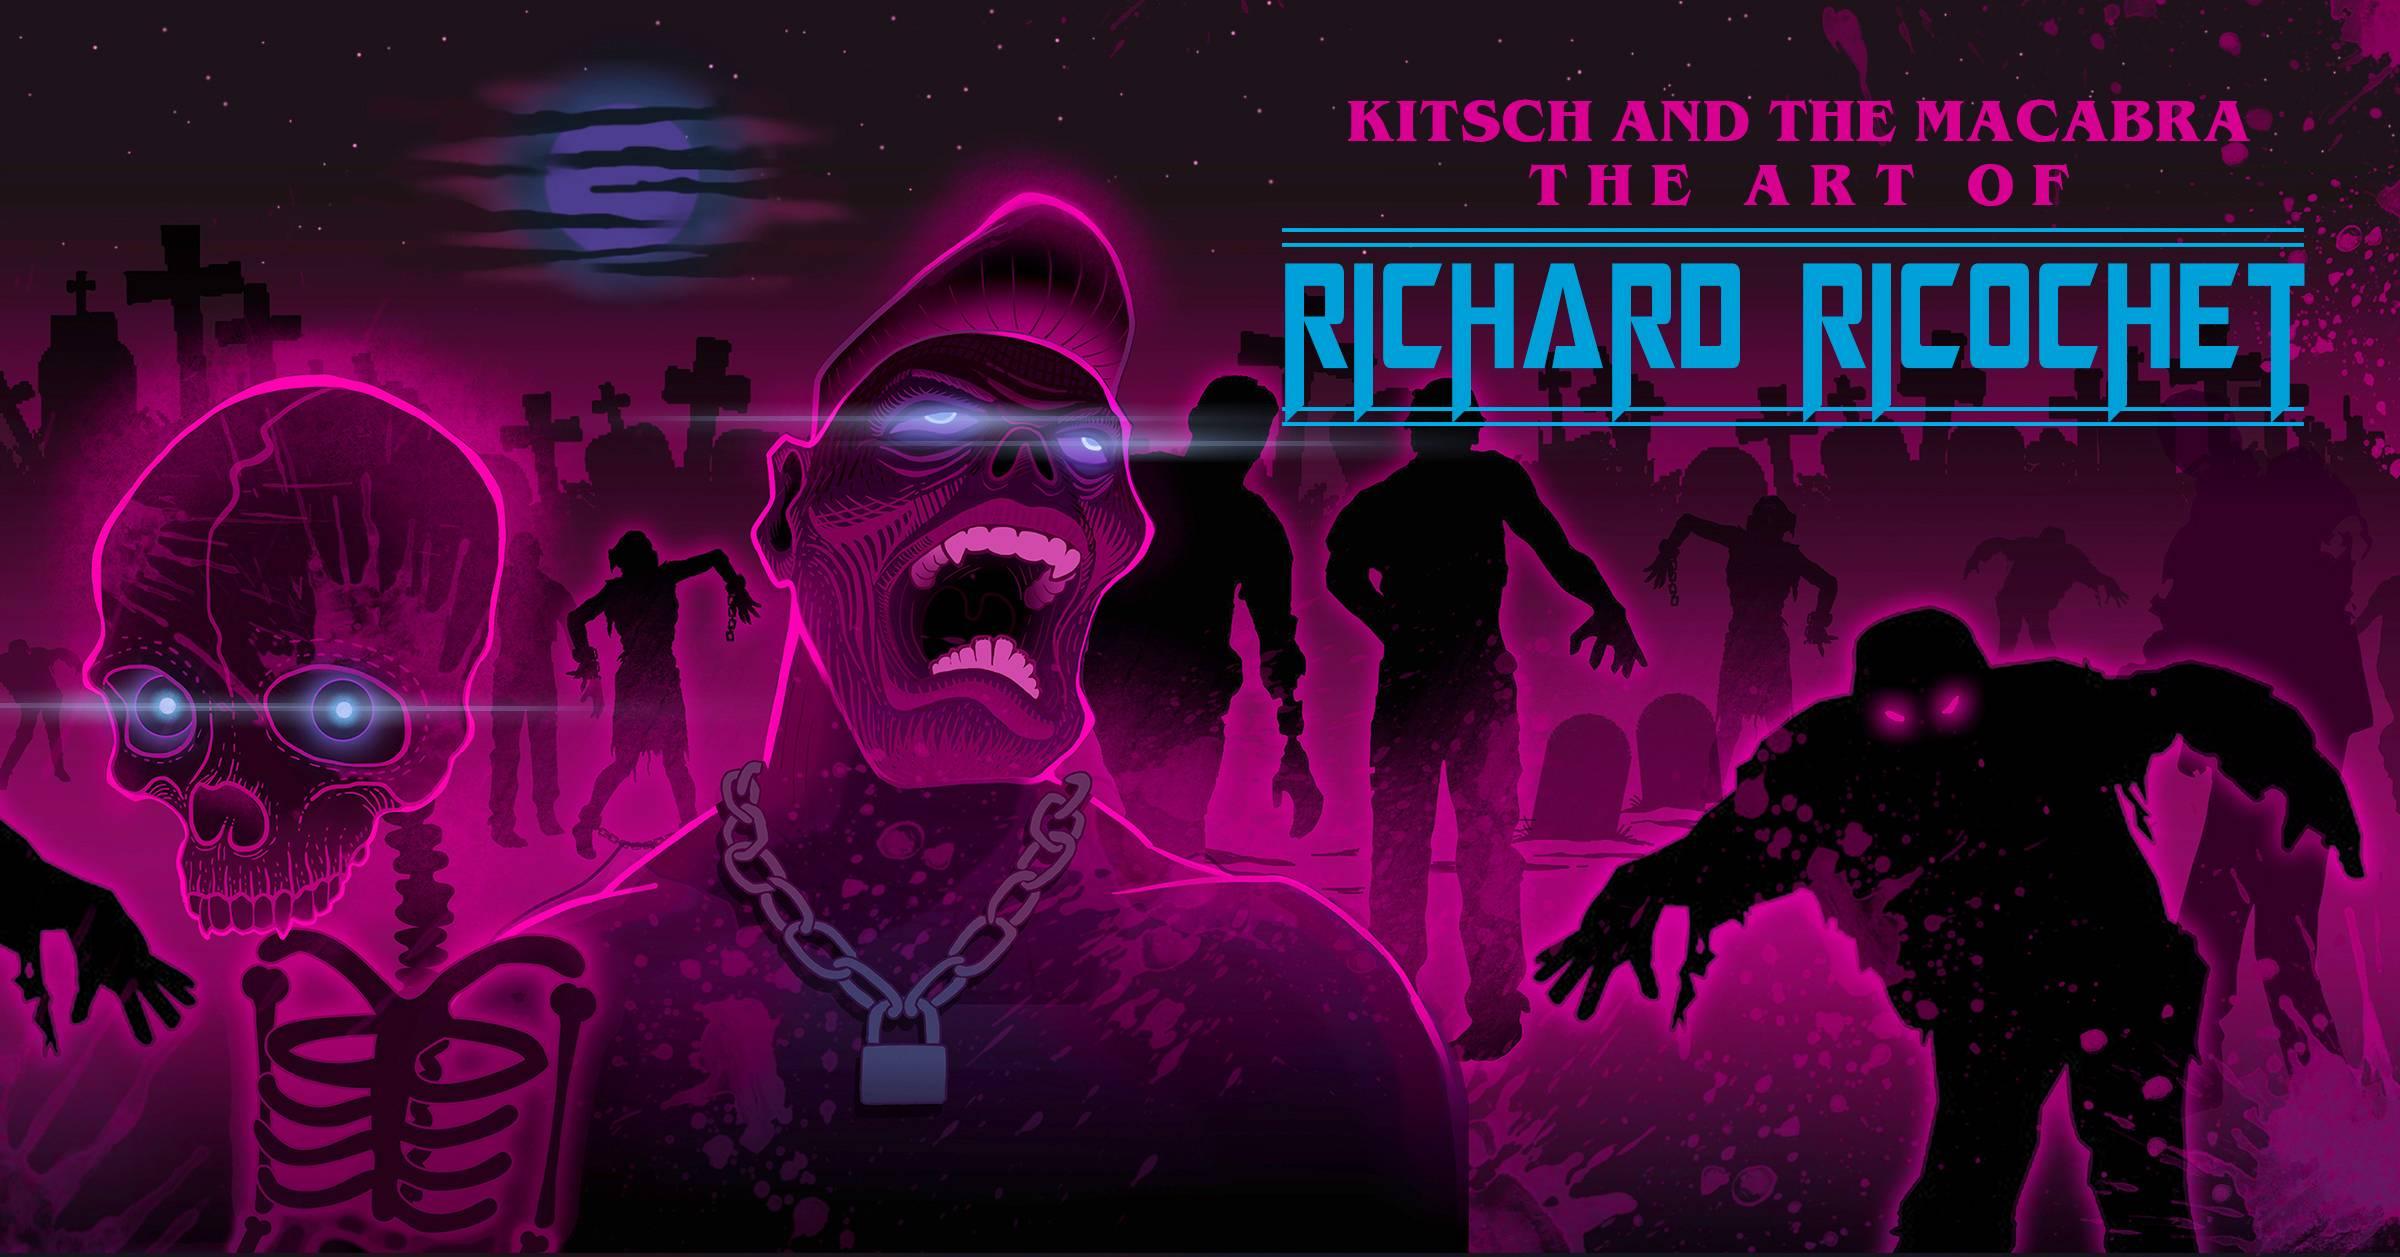 Richard Ricochet